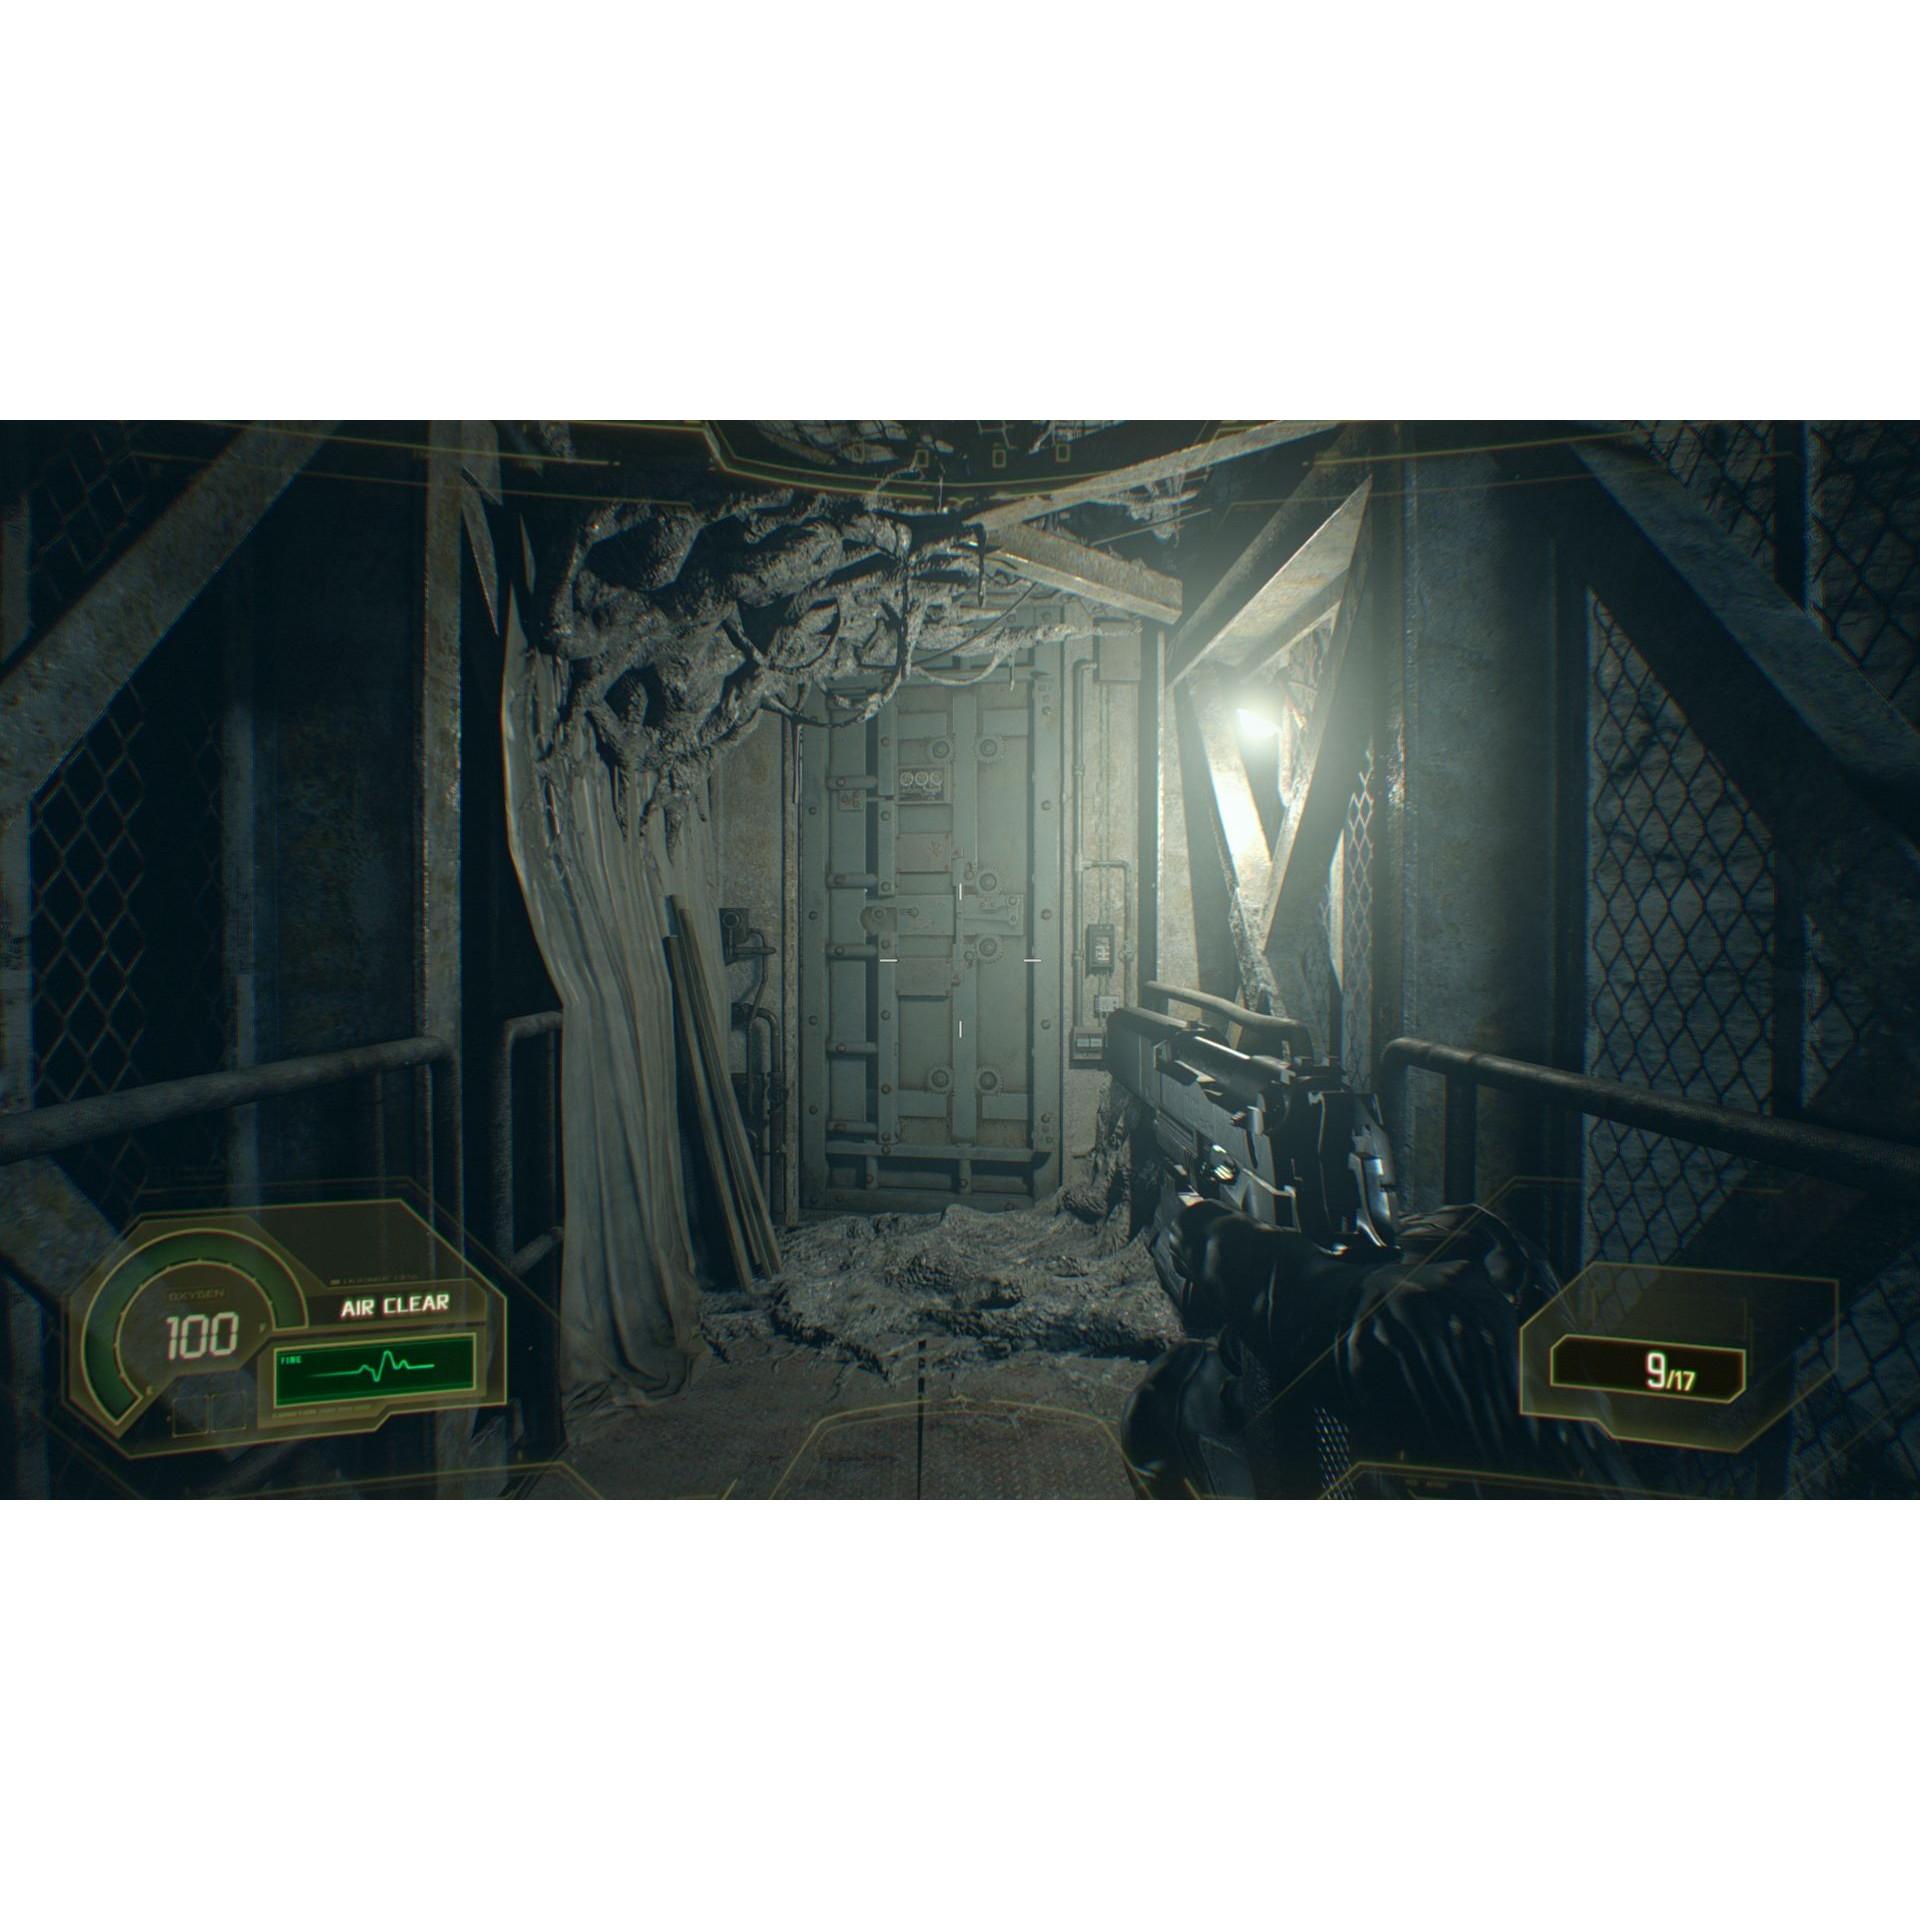 Joc RESIDENT EVIL 7 biohazard BIOHAZARD 7 resident evil Steam Key Pentru Calculator 6